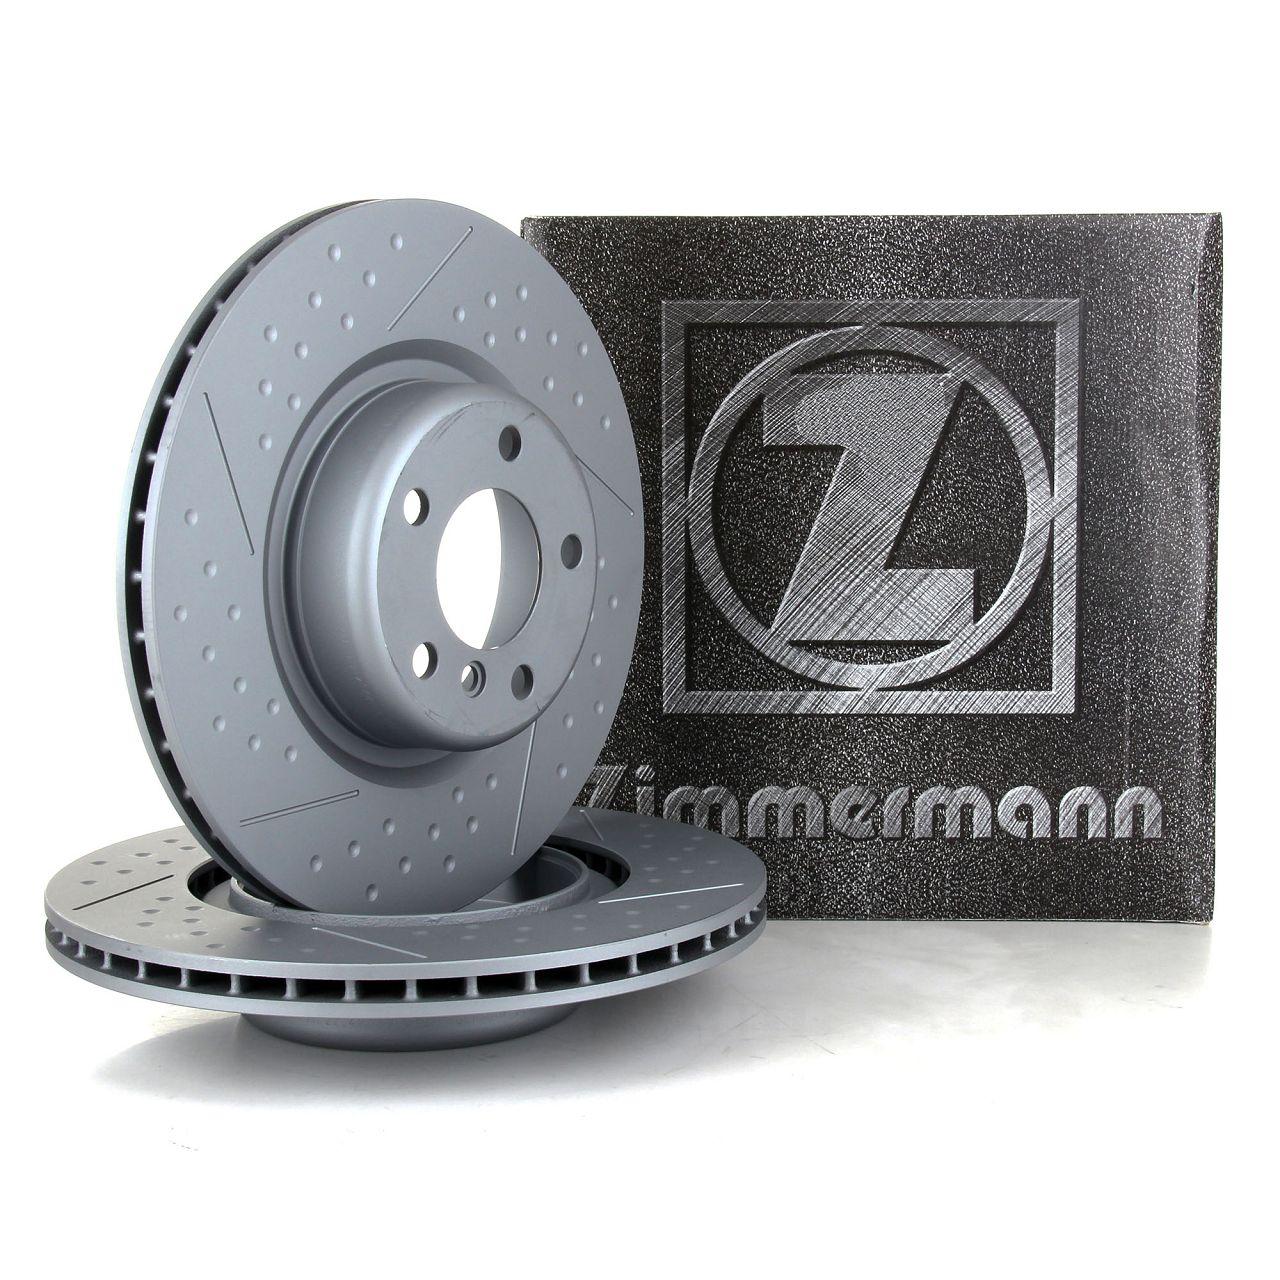 ZIMMERMANN Bremsscheiben für BMW F20 F21 F22 F23 F30 F31 F34 F32 F33 F36 hinten